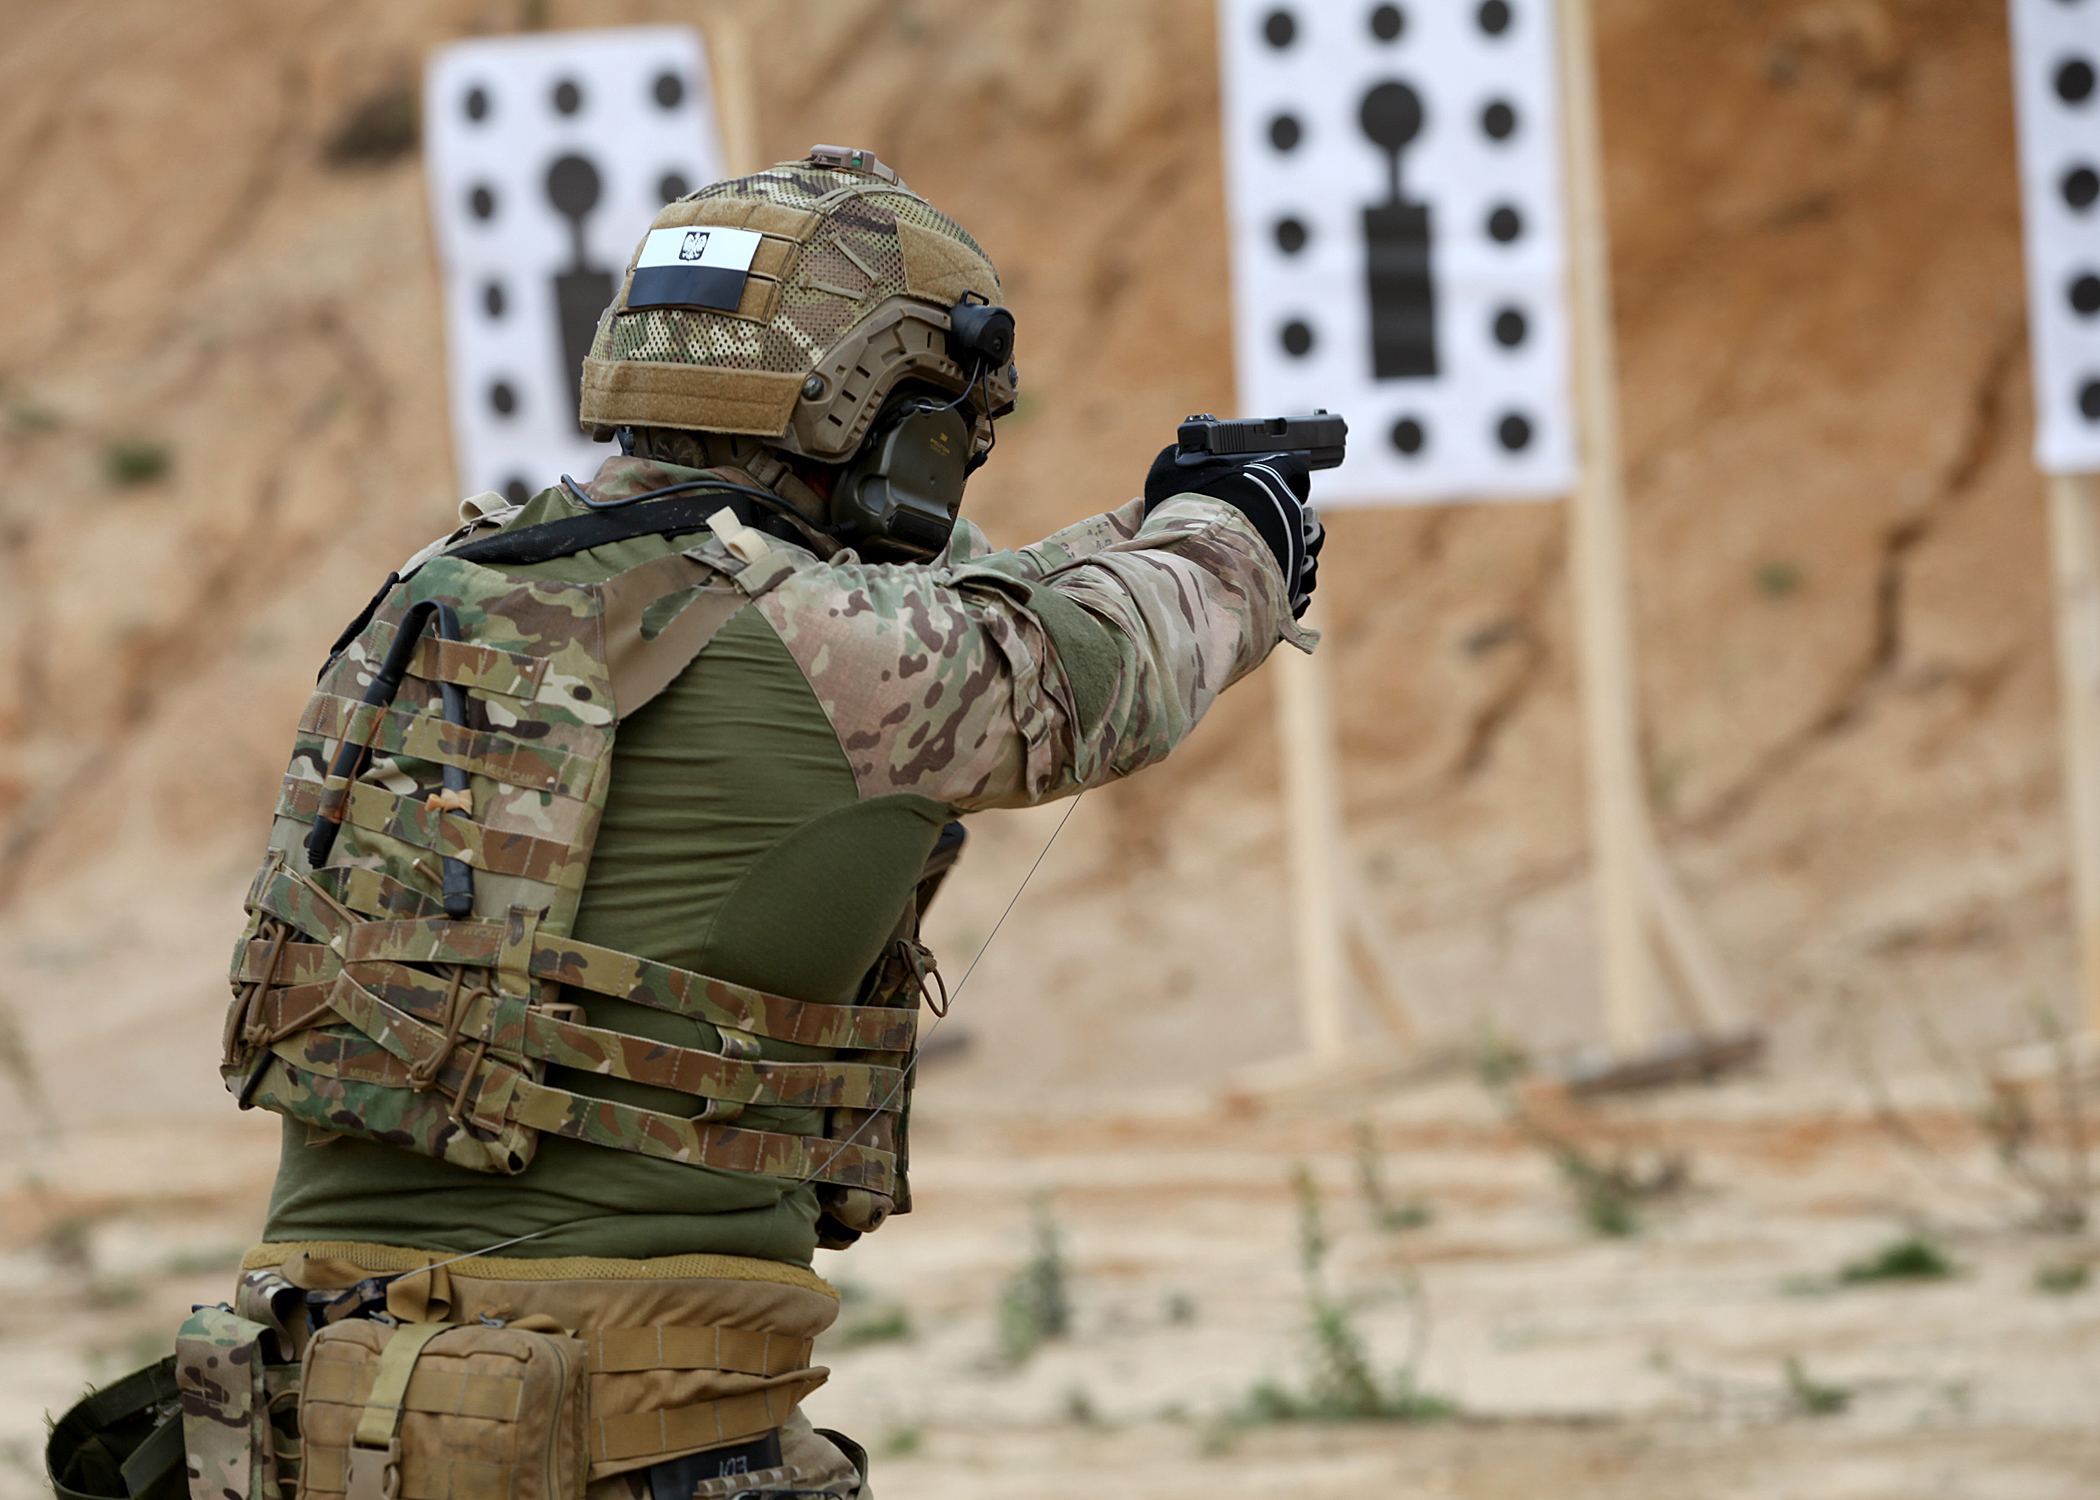 Польский спецназовец на учениях НАТО в Лиссабоне